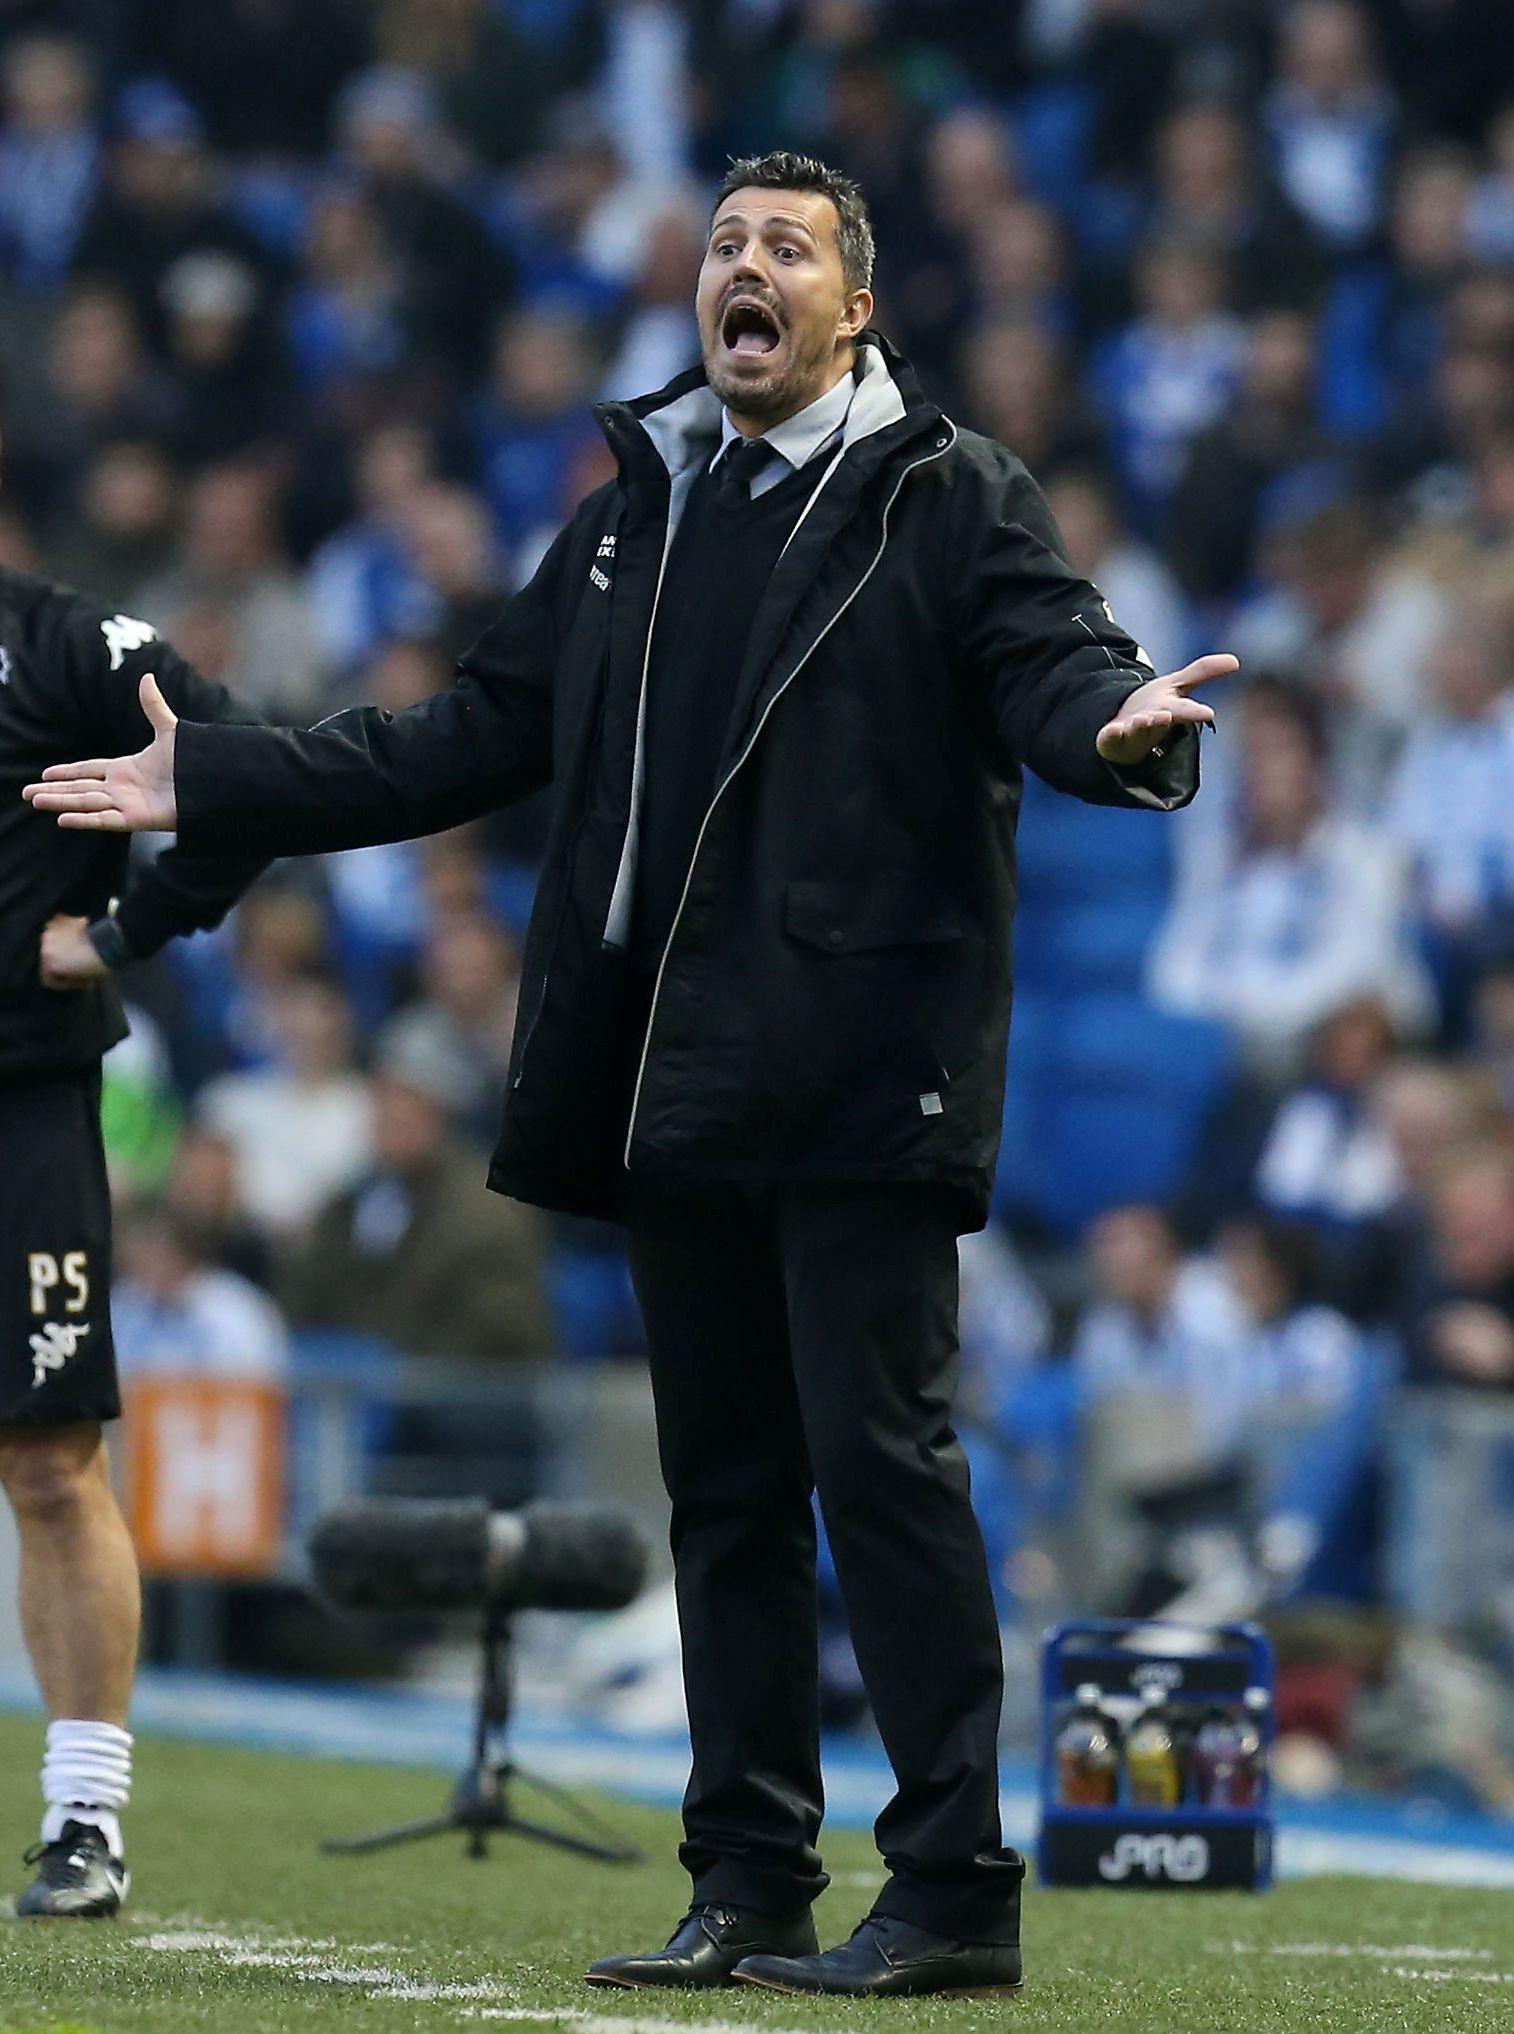 Ex-Albion boss Oscar Garcia takes helm at LaLiga strugglers